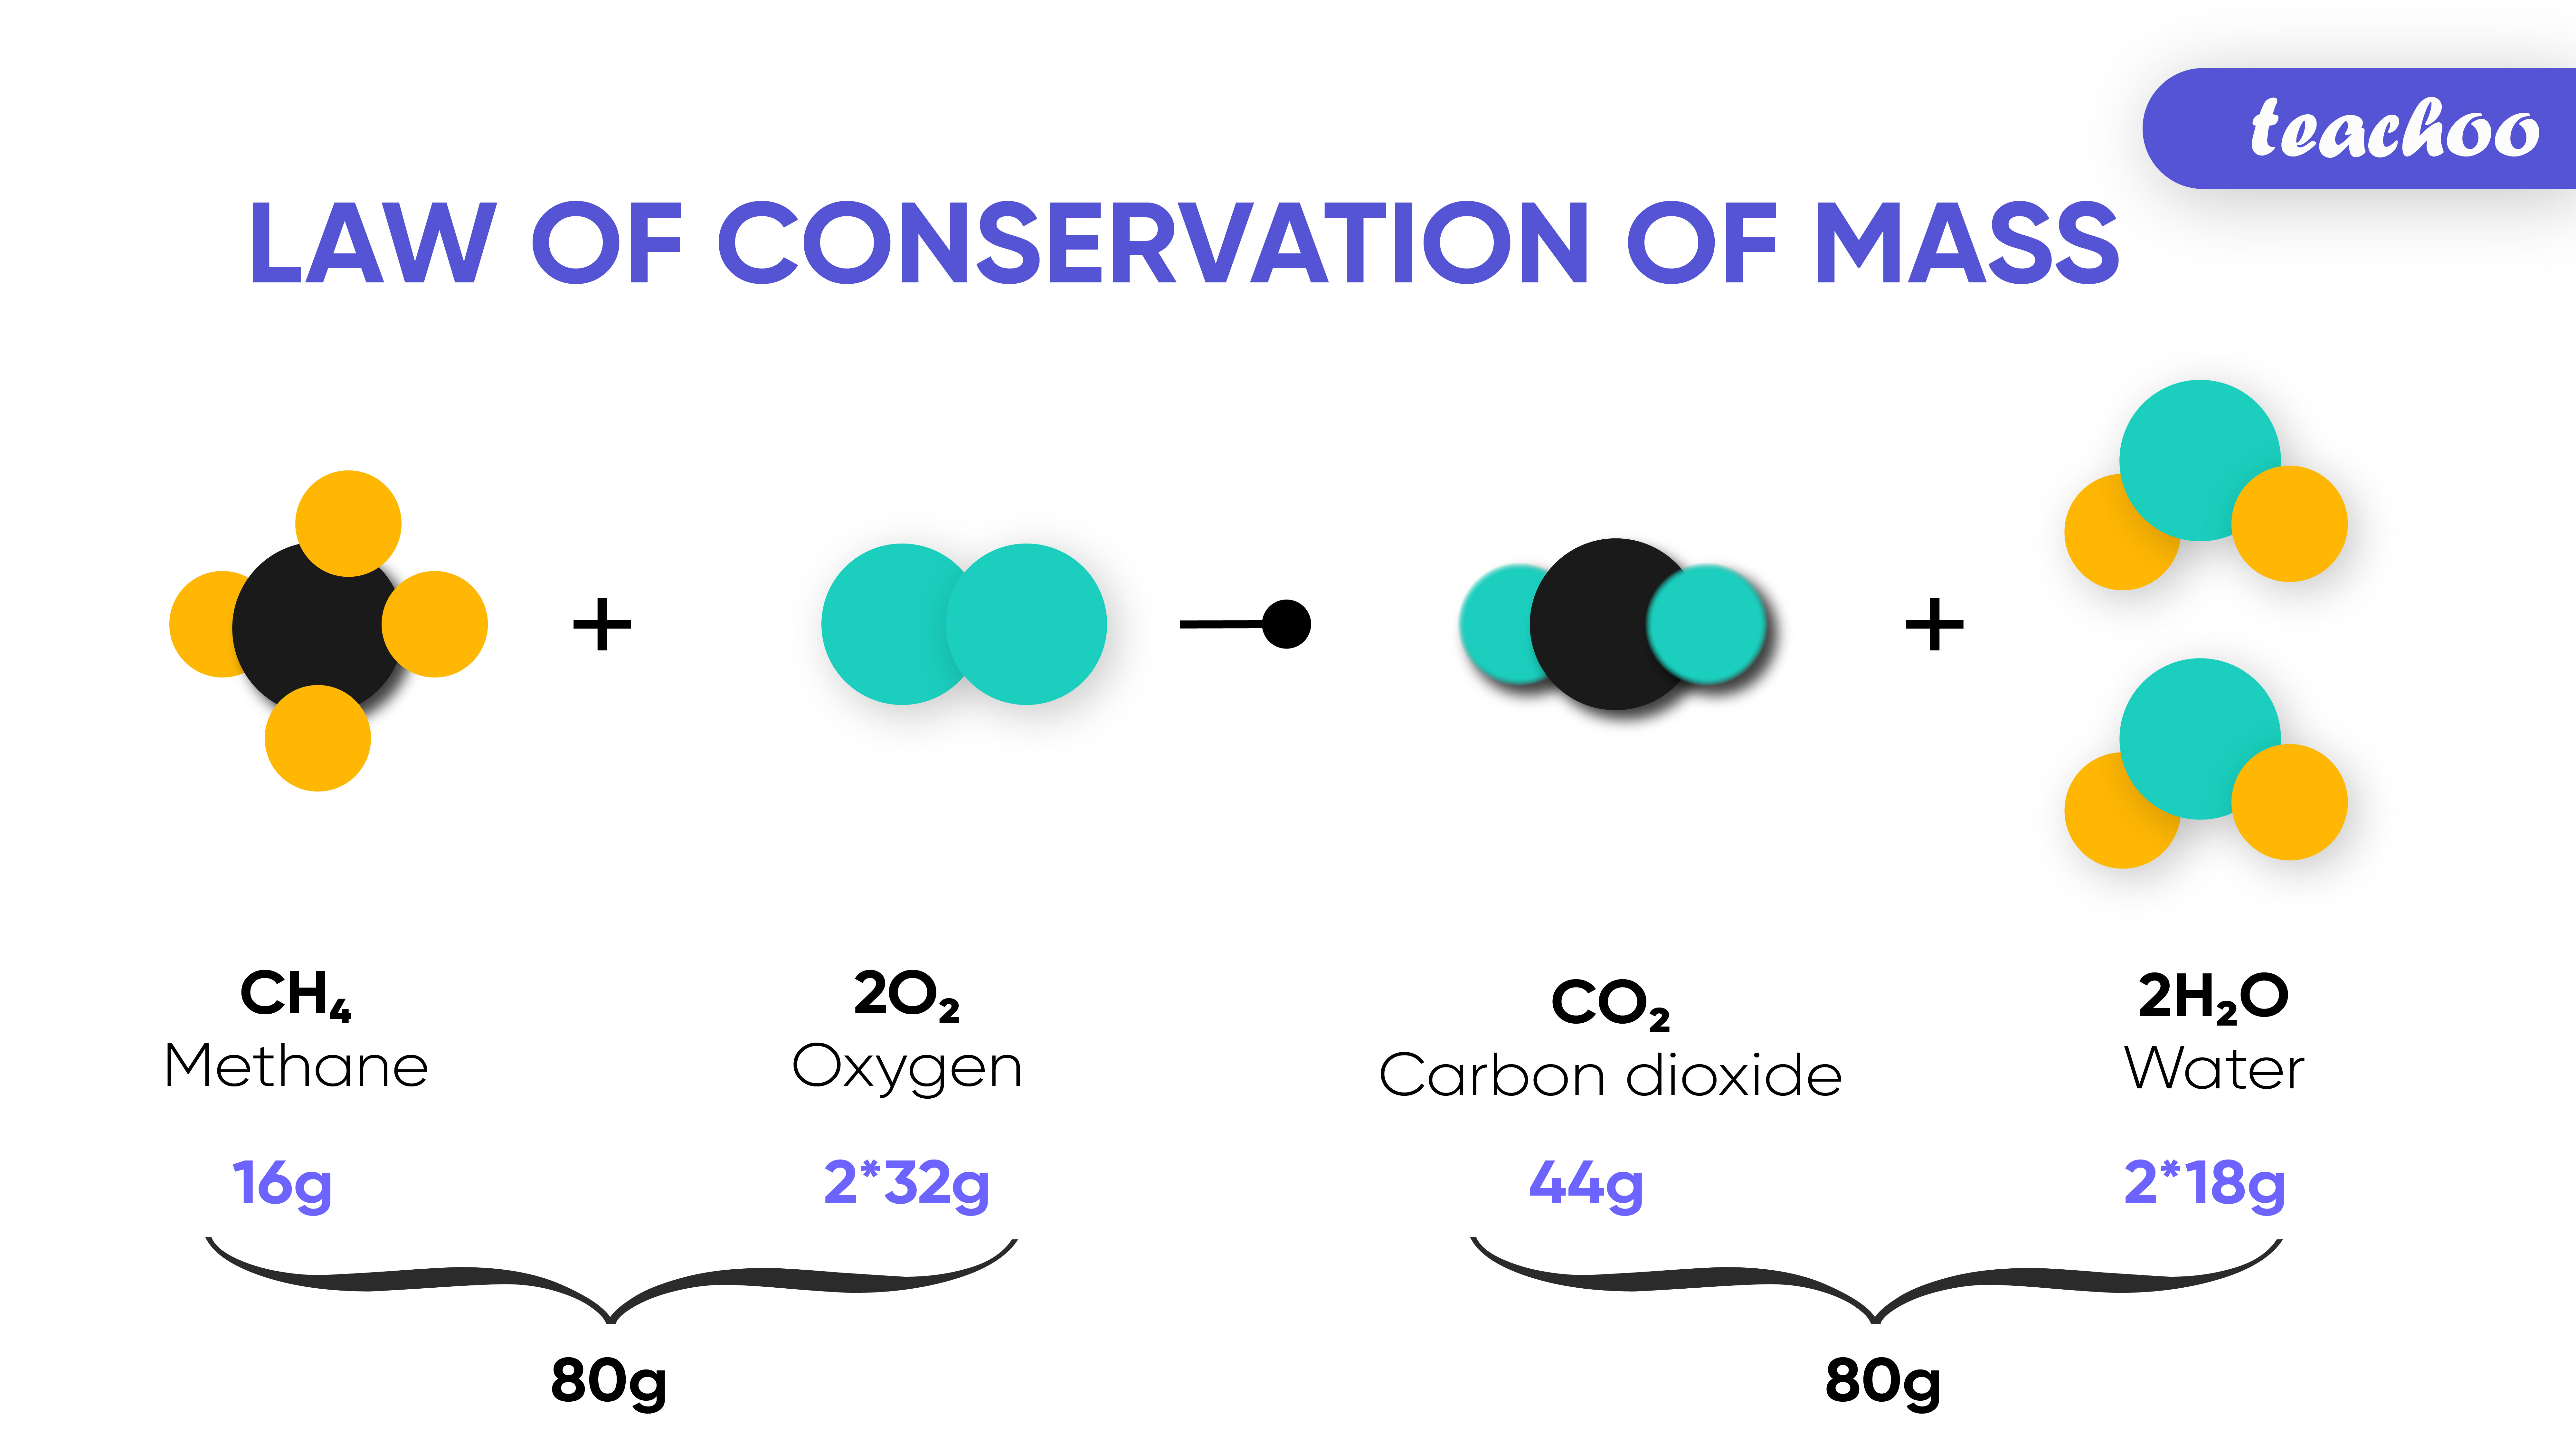 Law of conservation of mass. 2 image-Teachoo.jpg